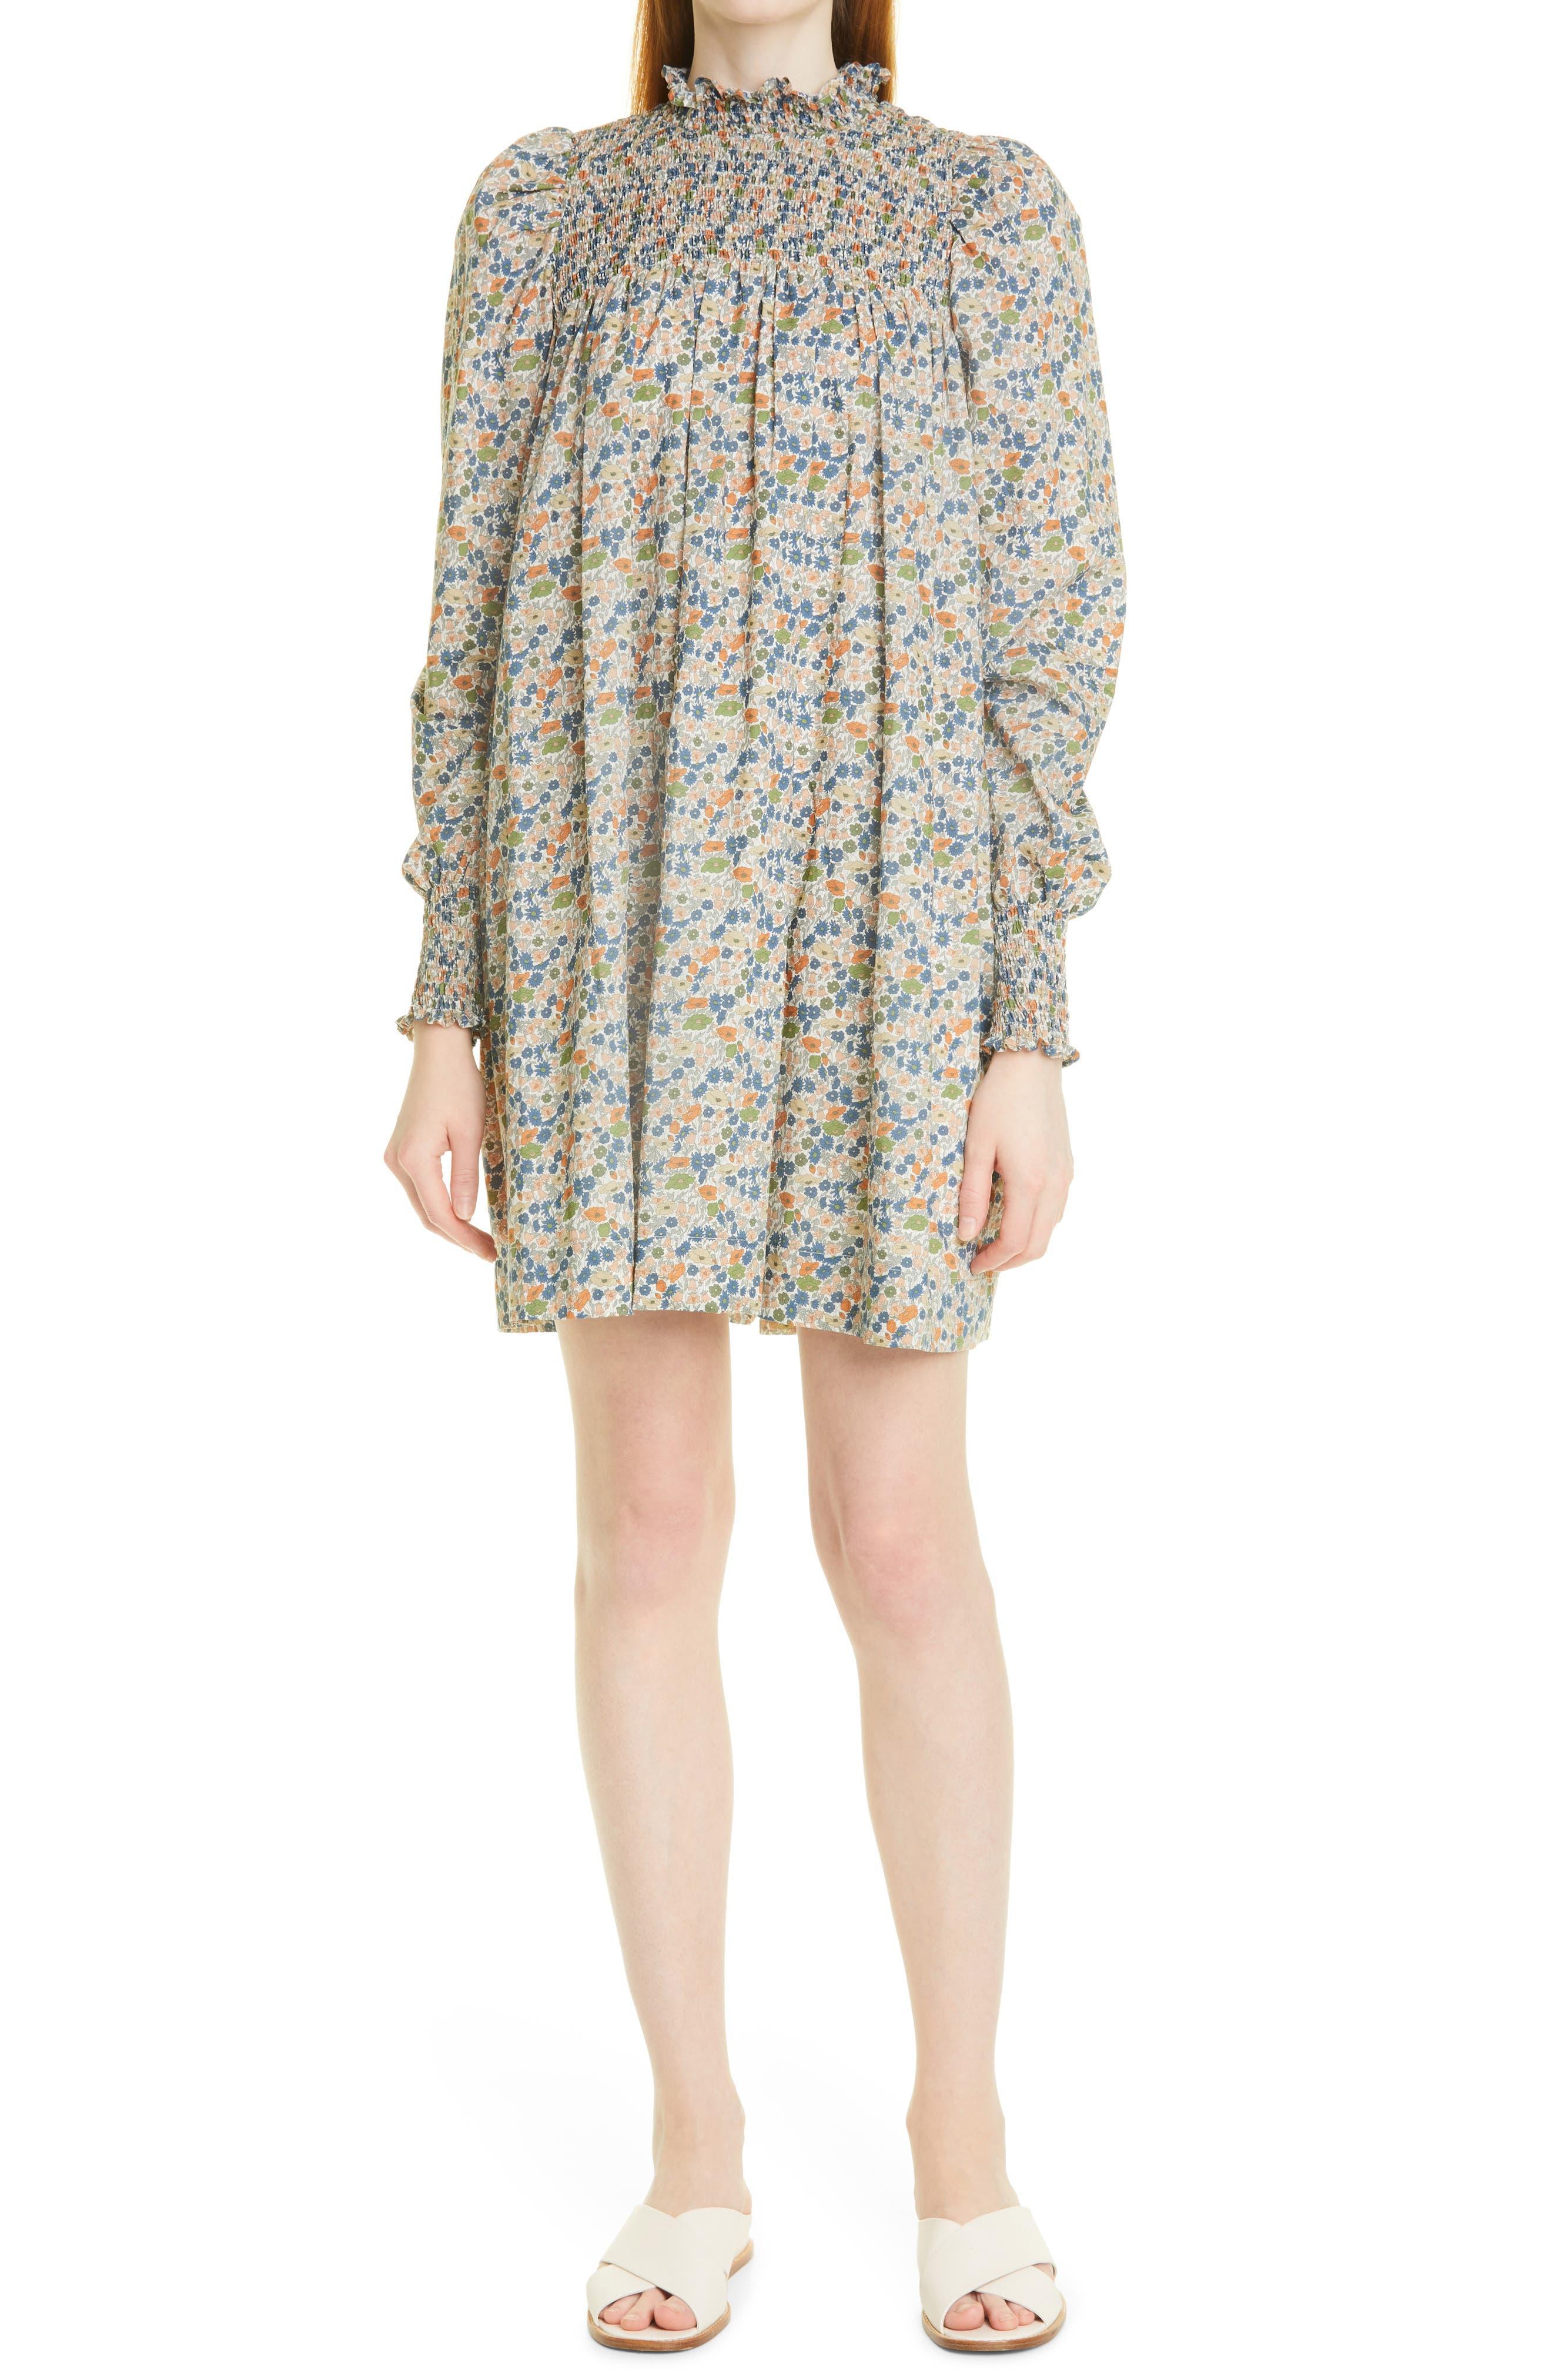 Cobra Liberty Organic Cotton Long Sleeve Dress